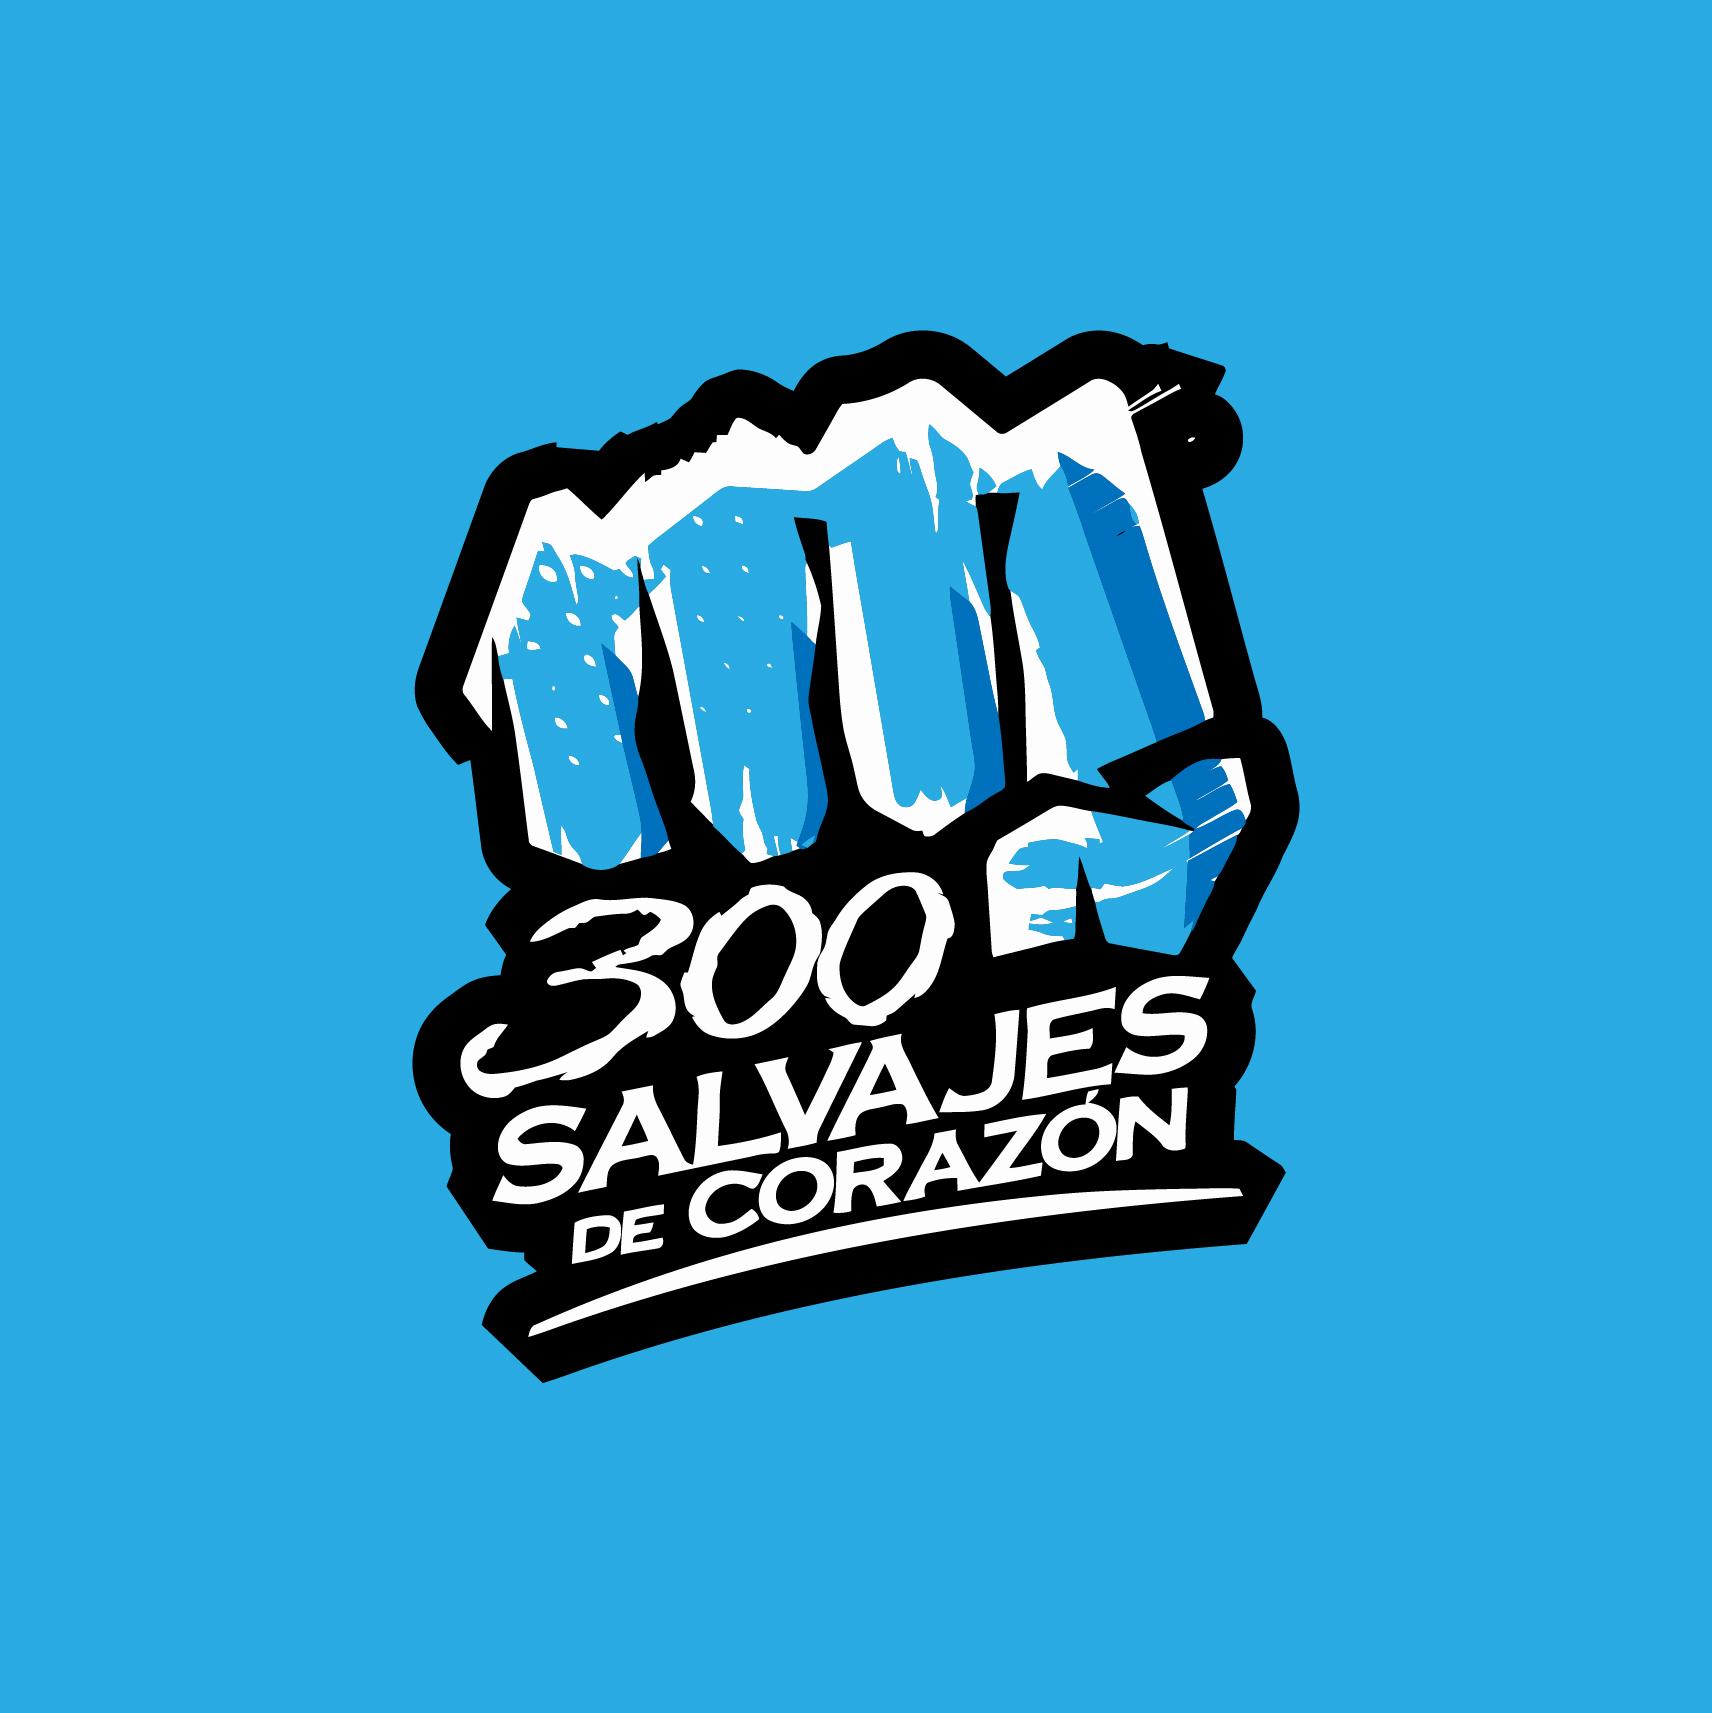 300 SDC